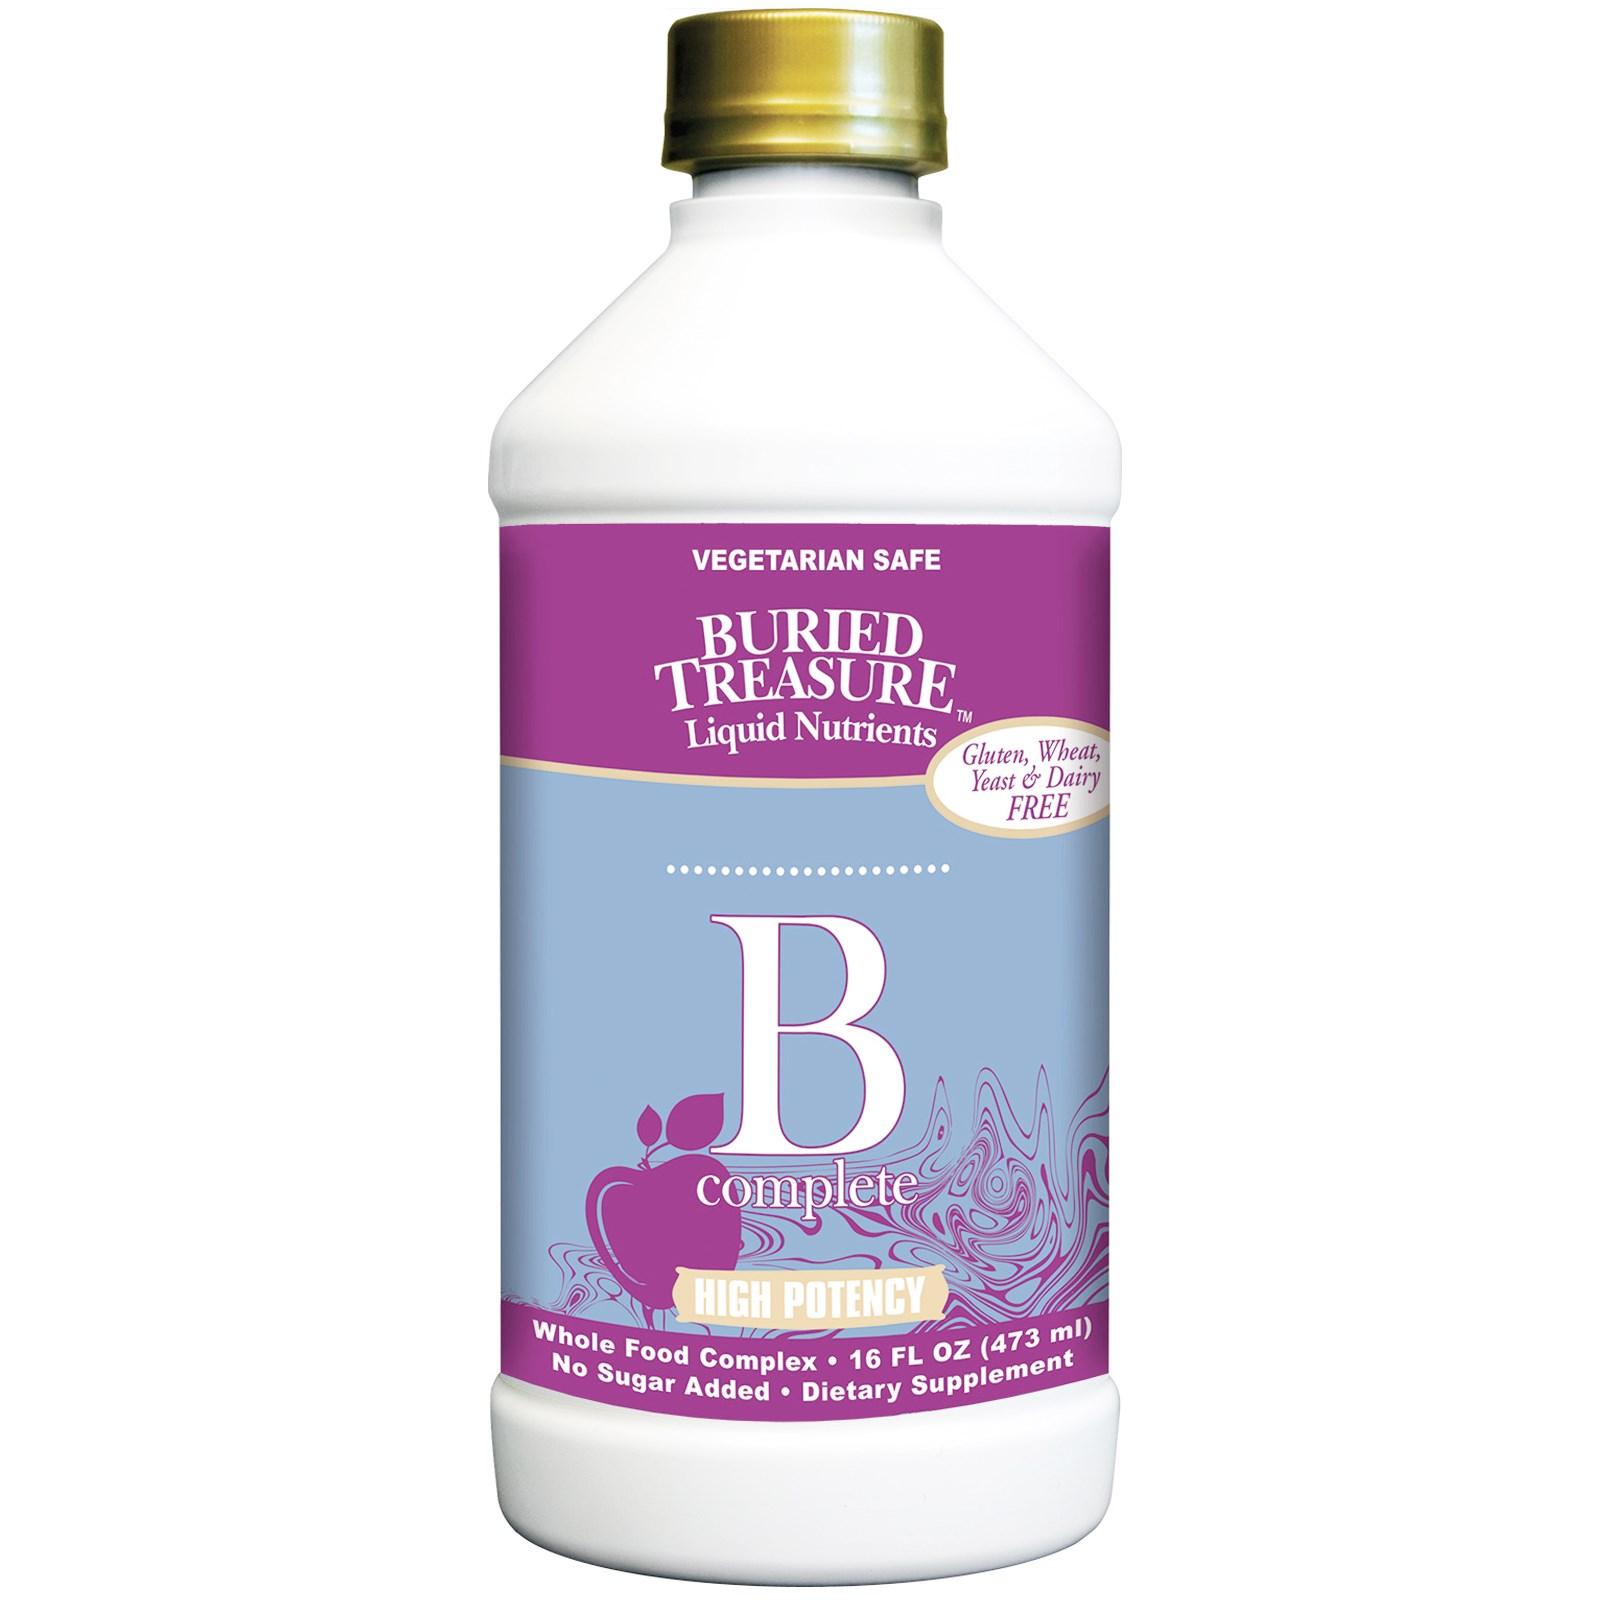 Buried Treasure, B Complete, High Potency, 16 fl oz (473 ml)